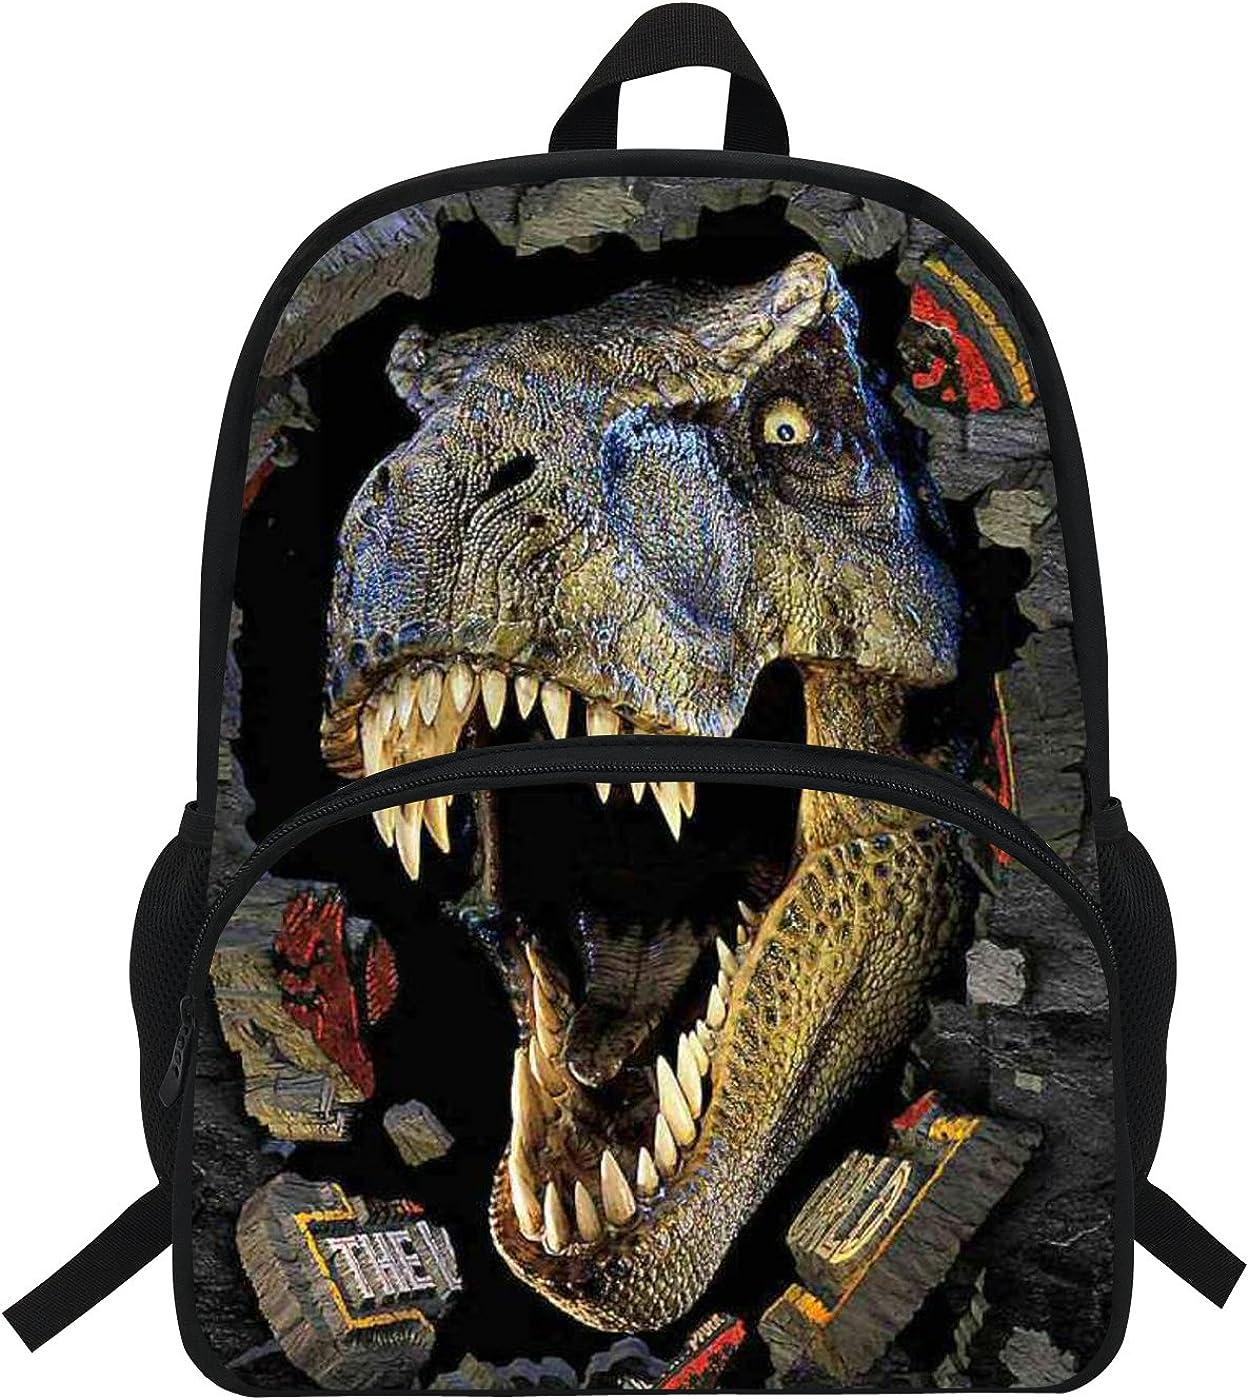 VEEWOW 16-Inch Popular Animal Backpack Horse Pattern Children School Bags